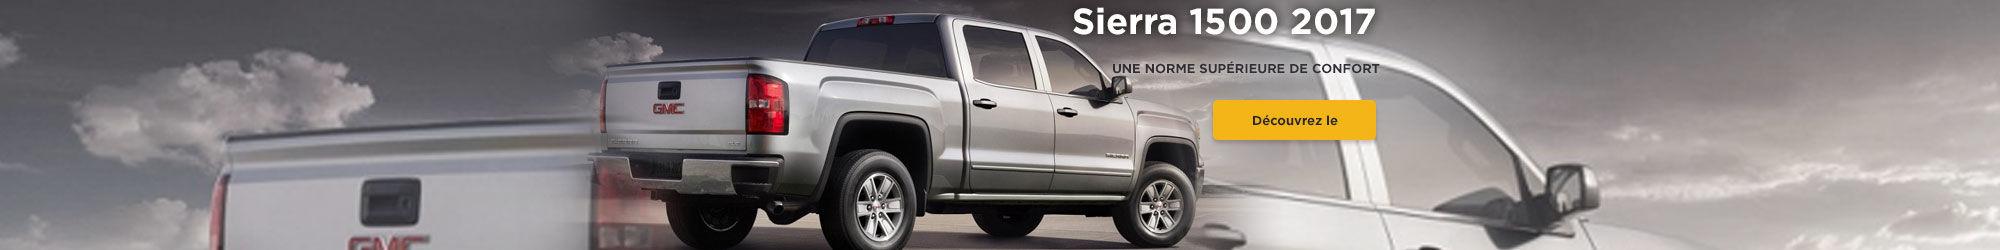 Sierra 1500 2017